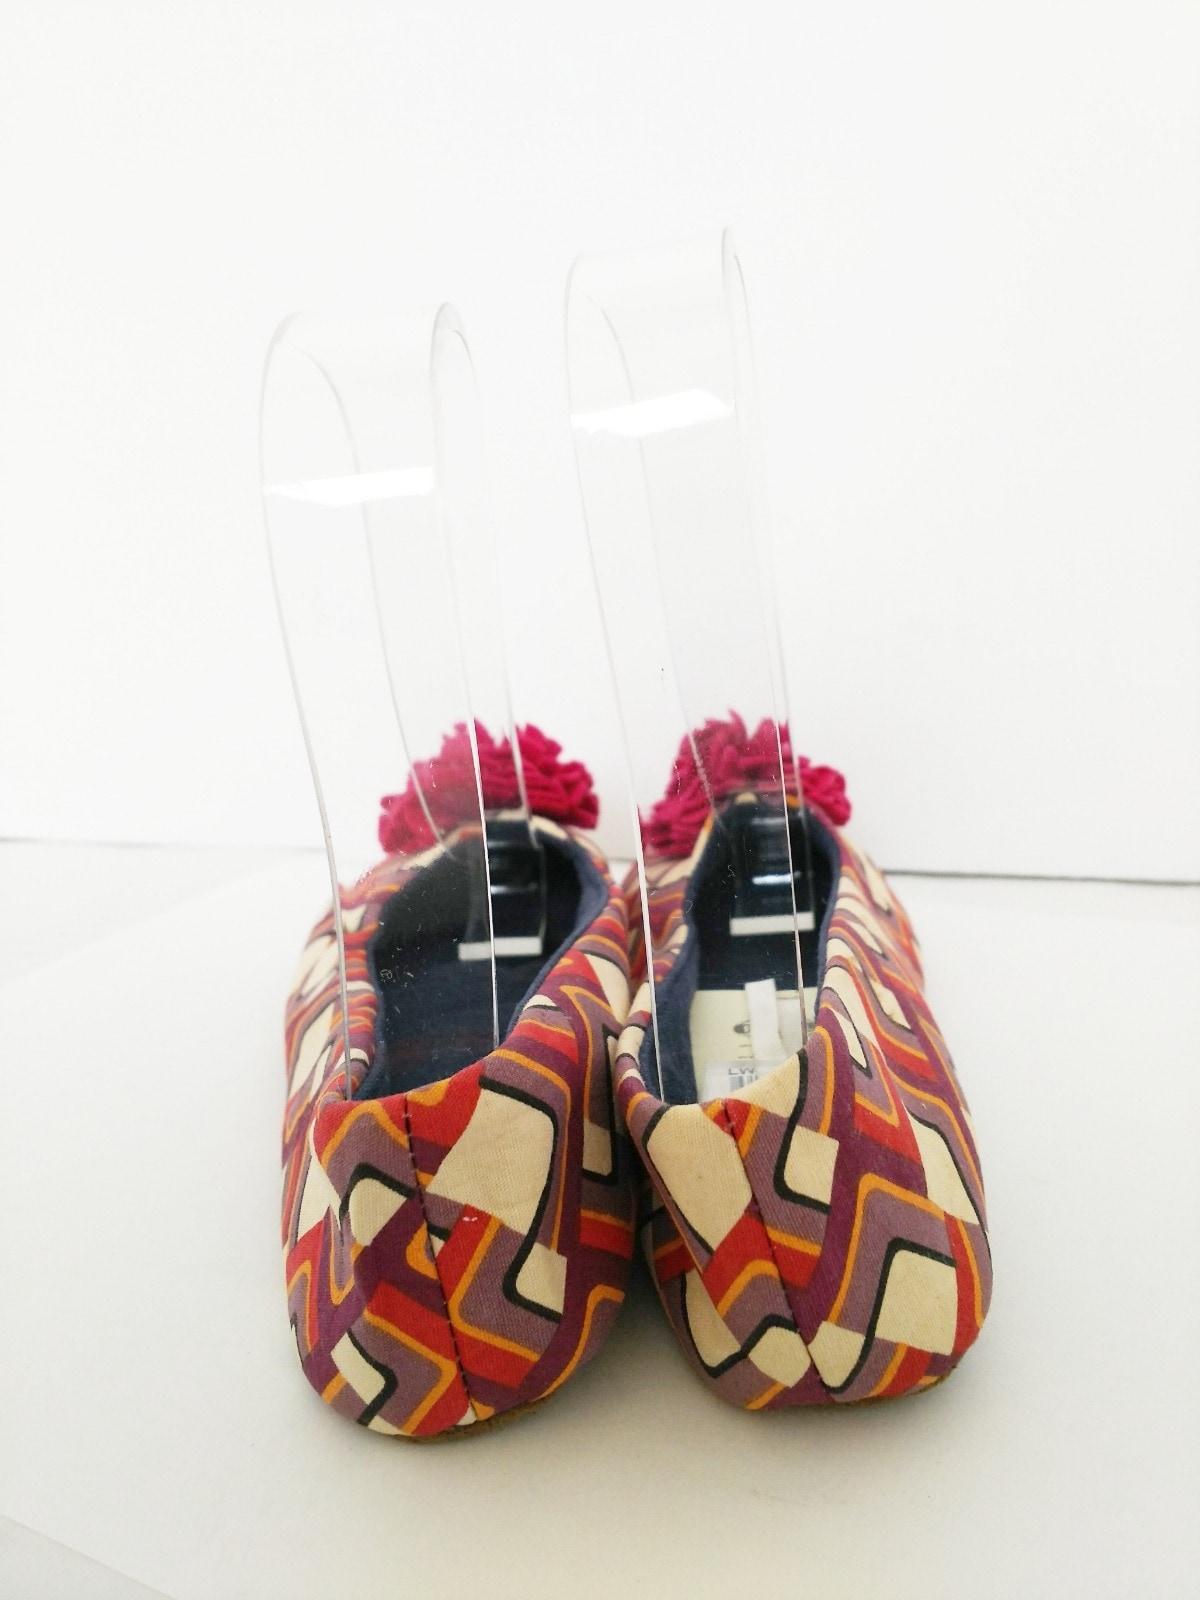 FOSSIL(フォッシル)のその他靴